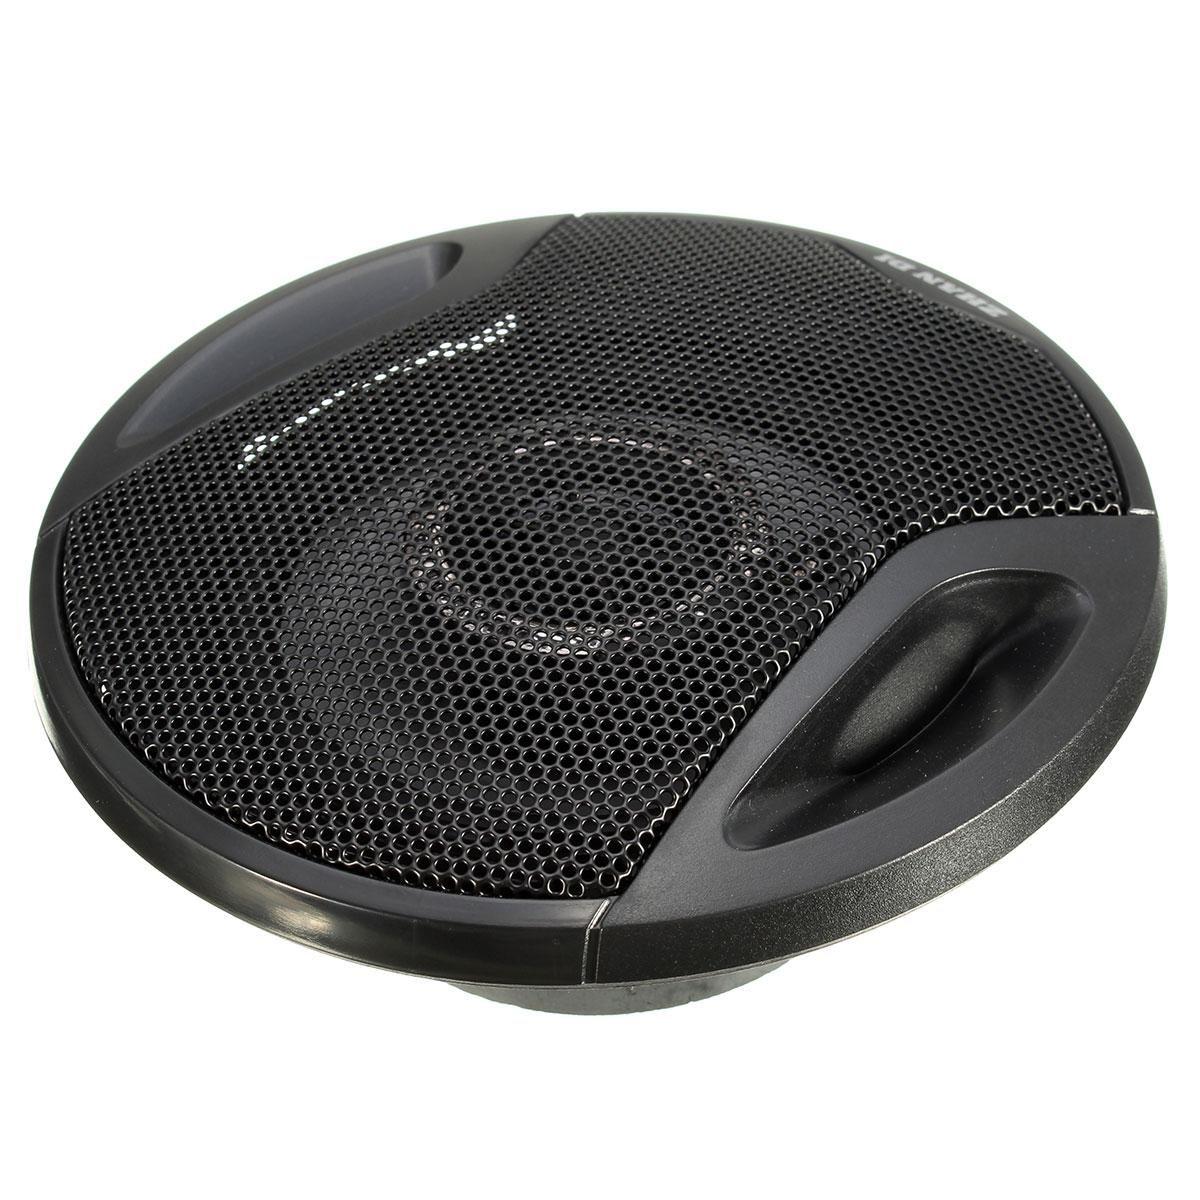 New Pair 4 Inch 10cm Car Speakers /Car Tweeters Dual Cone Coaxial Car Van Front Rear Door Dash  240W